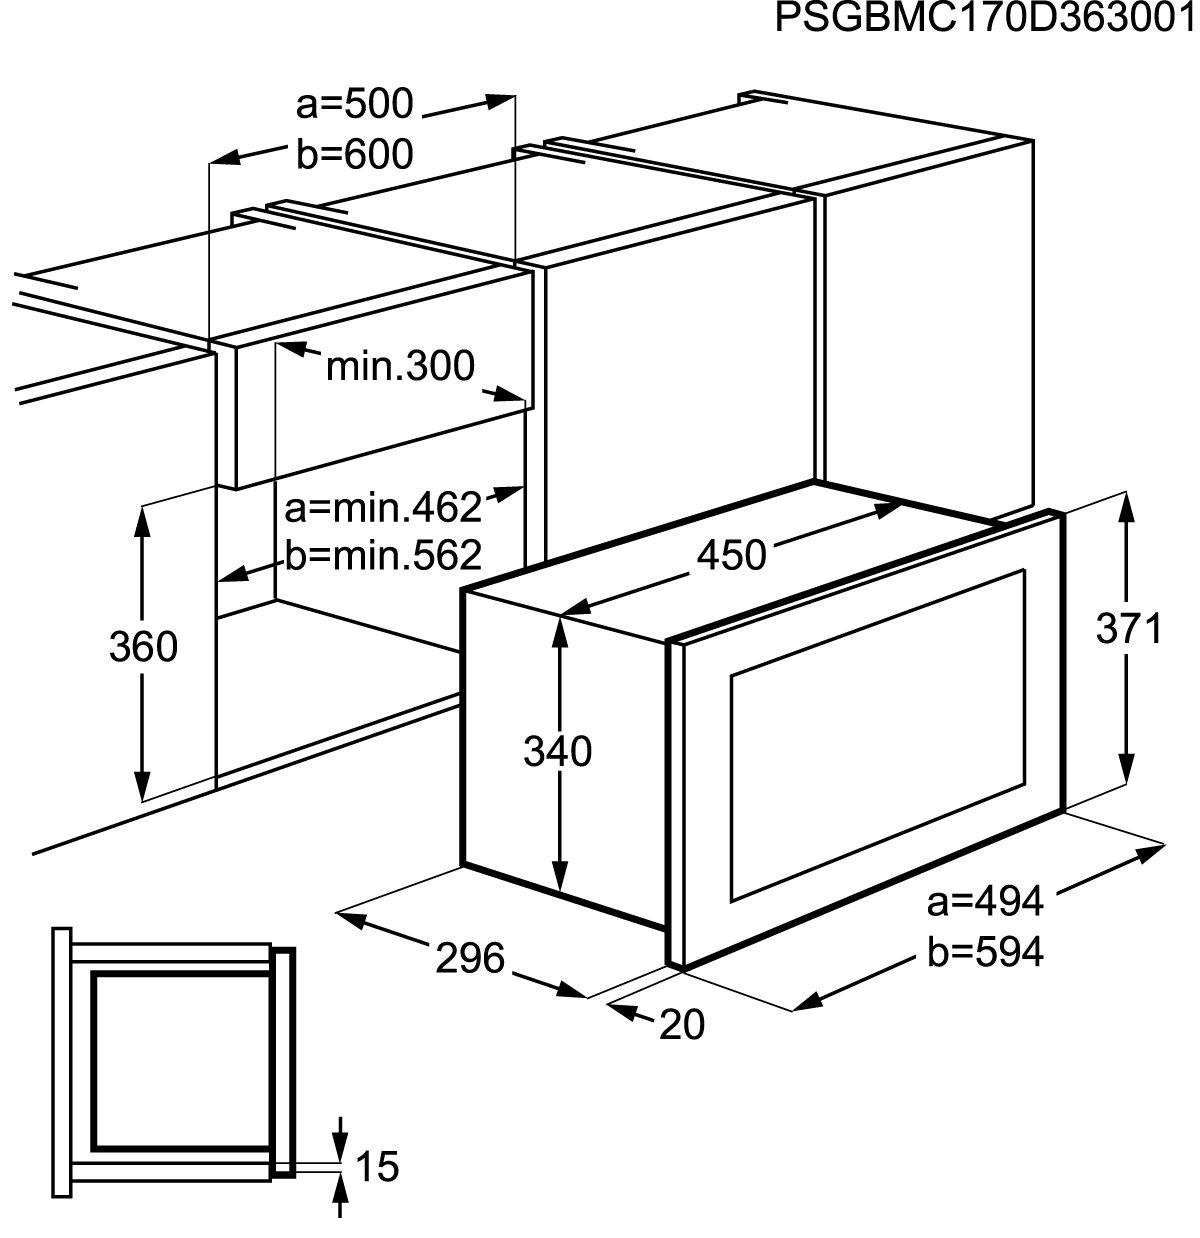 AEG MBB1755S-M acero fino Einbau-microonda Solo: Amazon.es ...